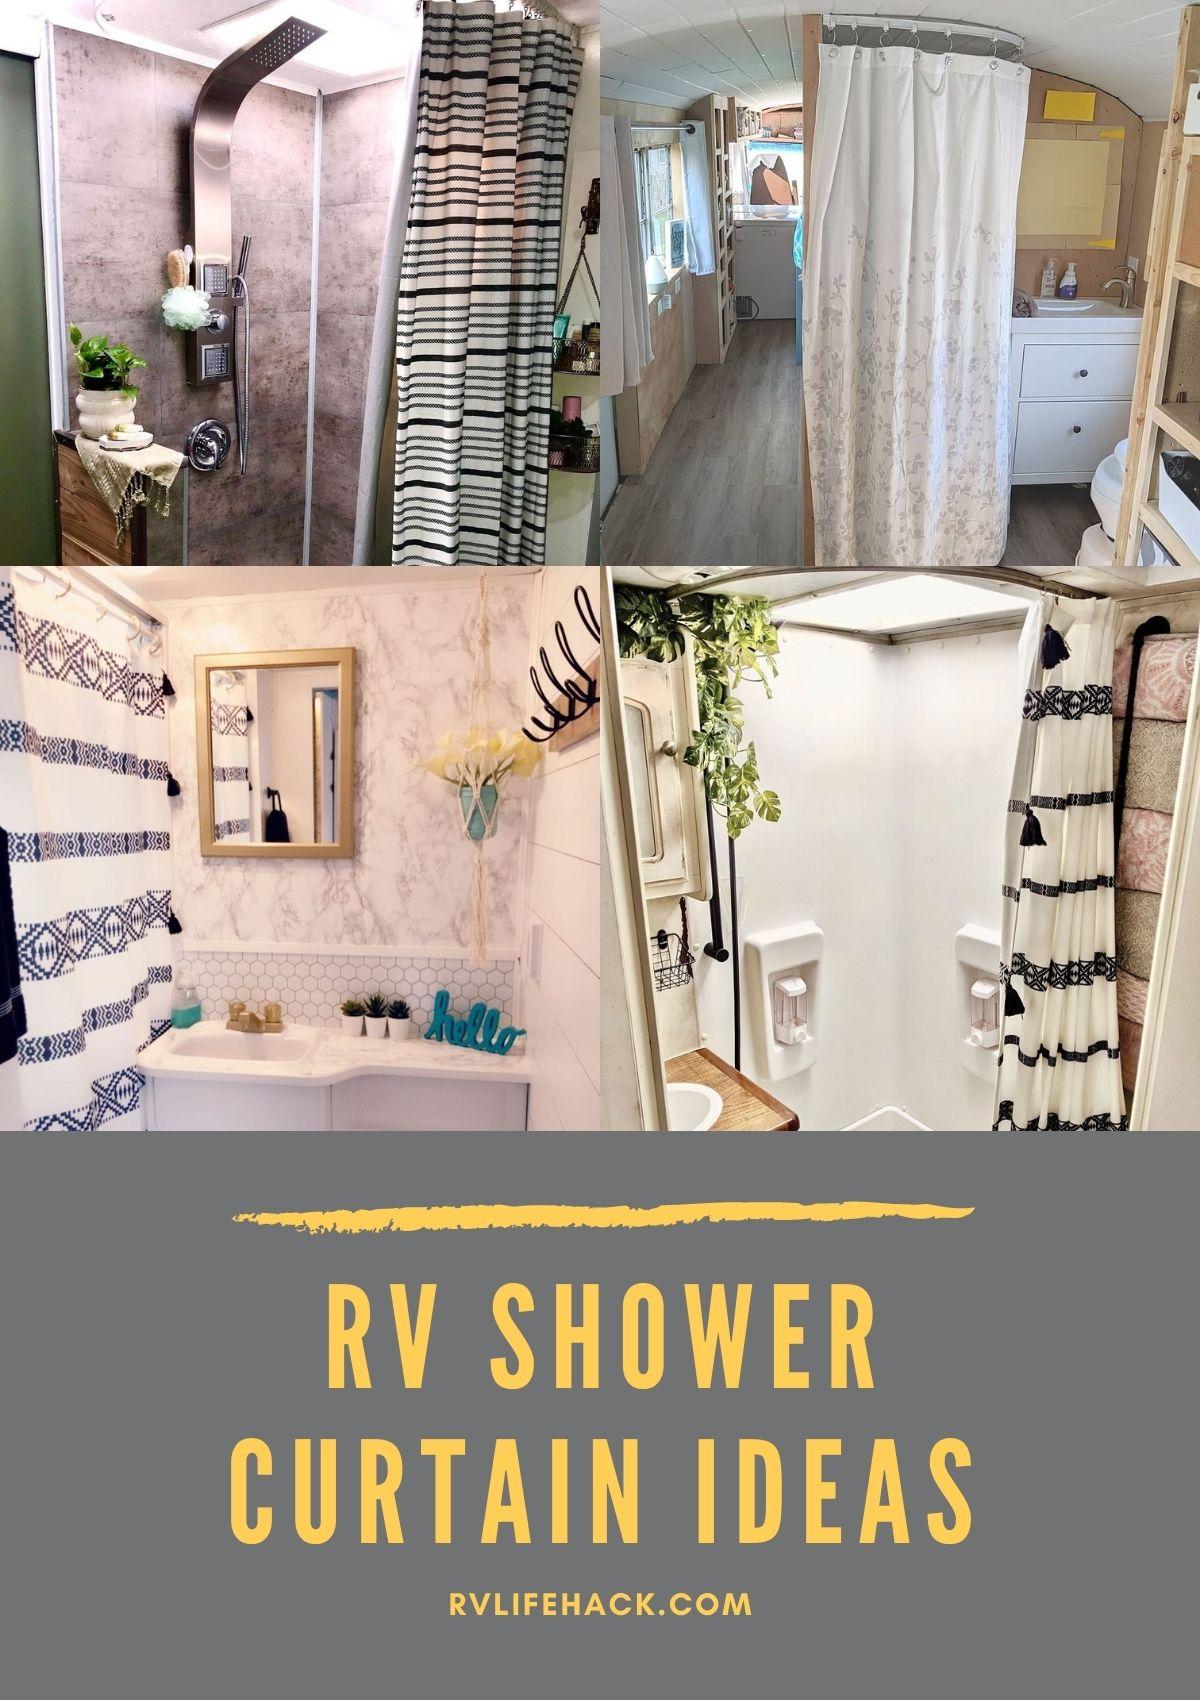 RV Shower Curtain Ideas (RV Outdoor Shower Curtain)